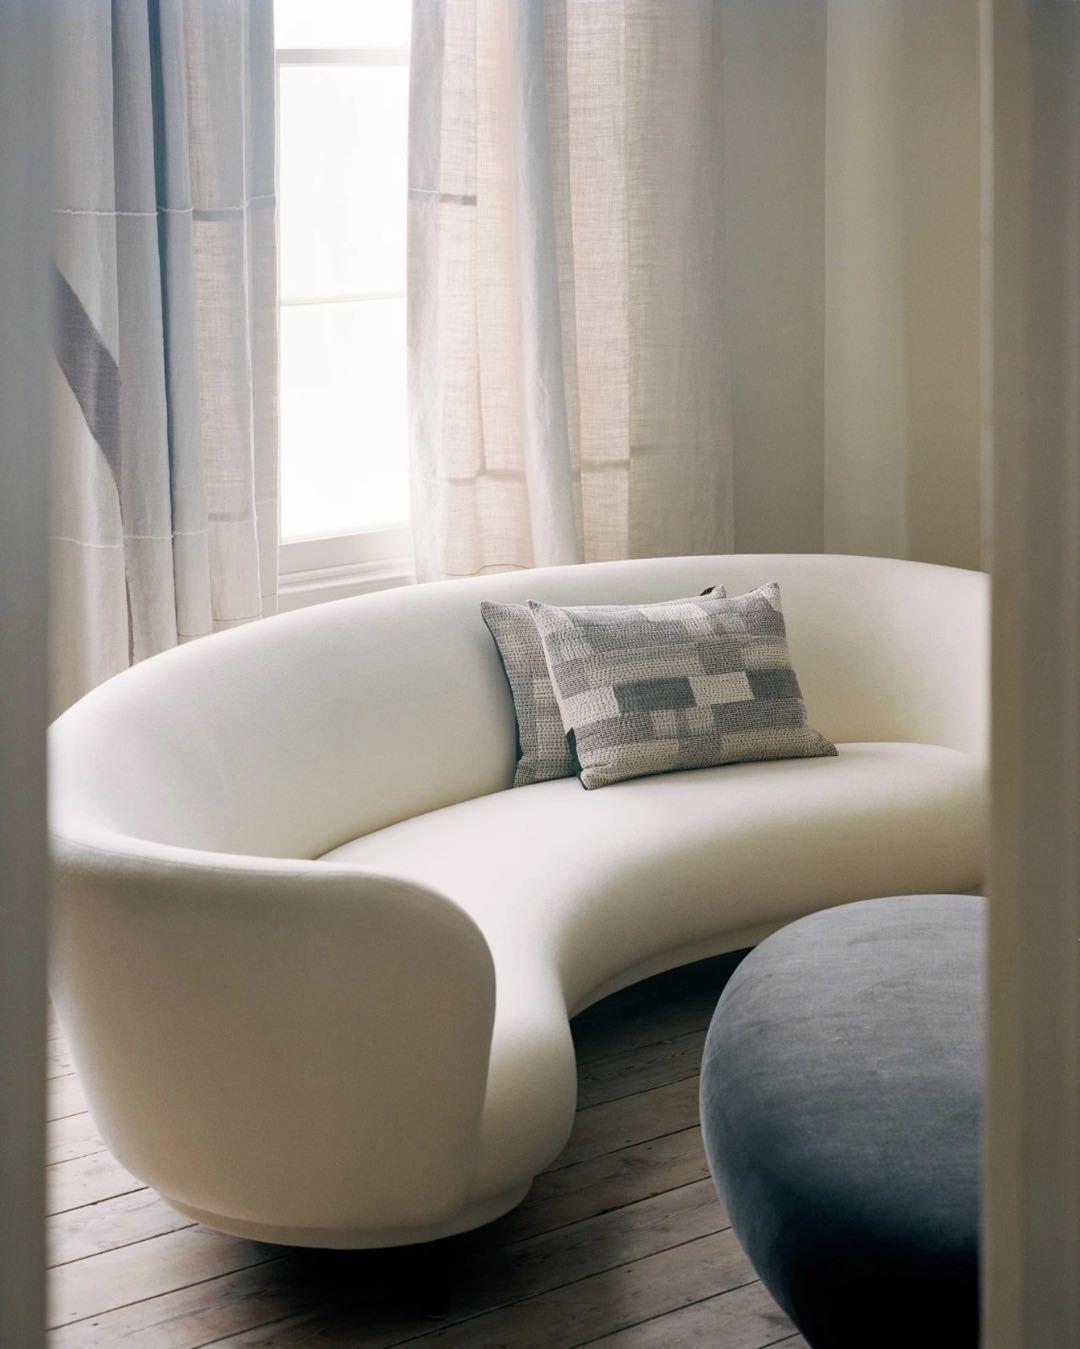 Pin by Reton on 搜图   Grey houses, Minimalism interior ...